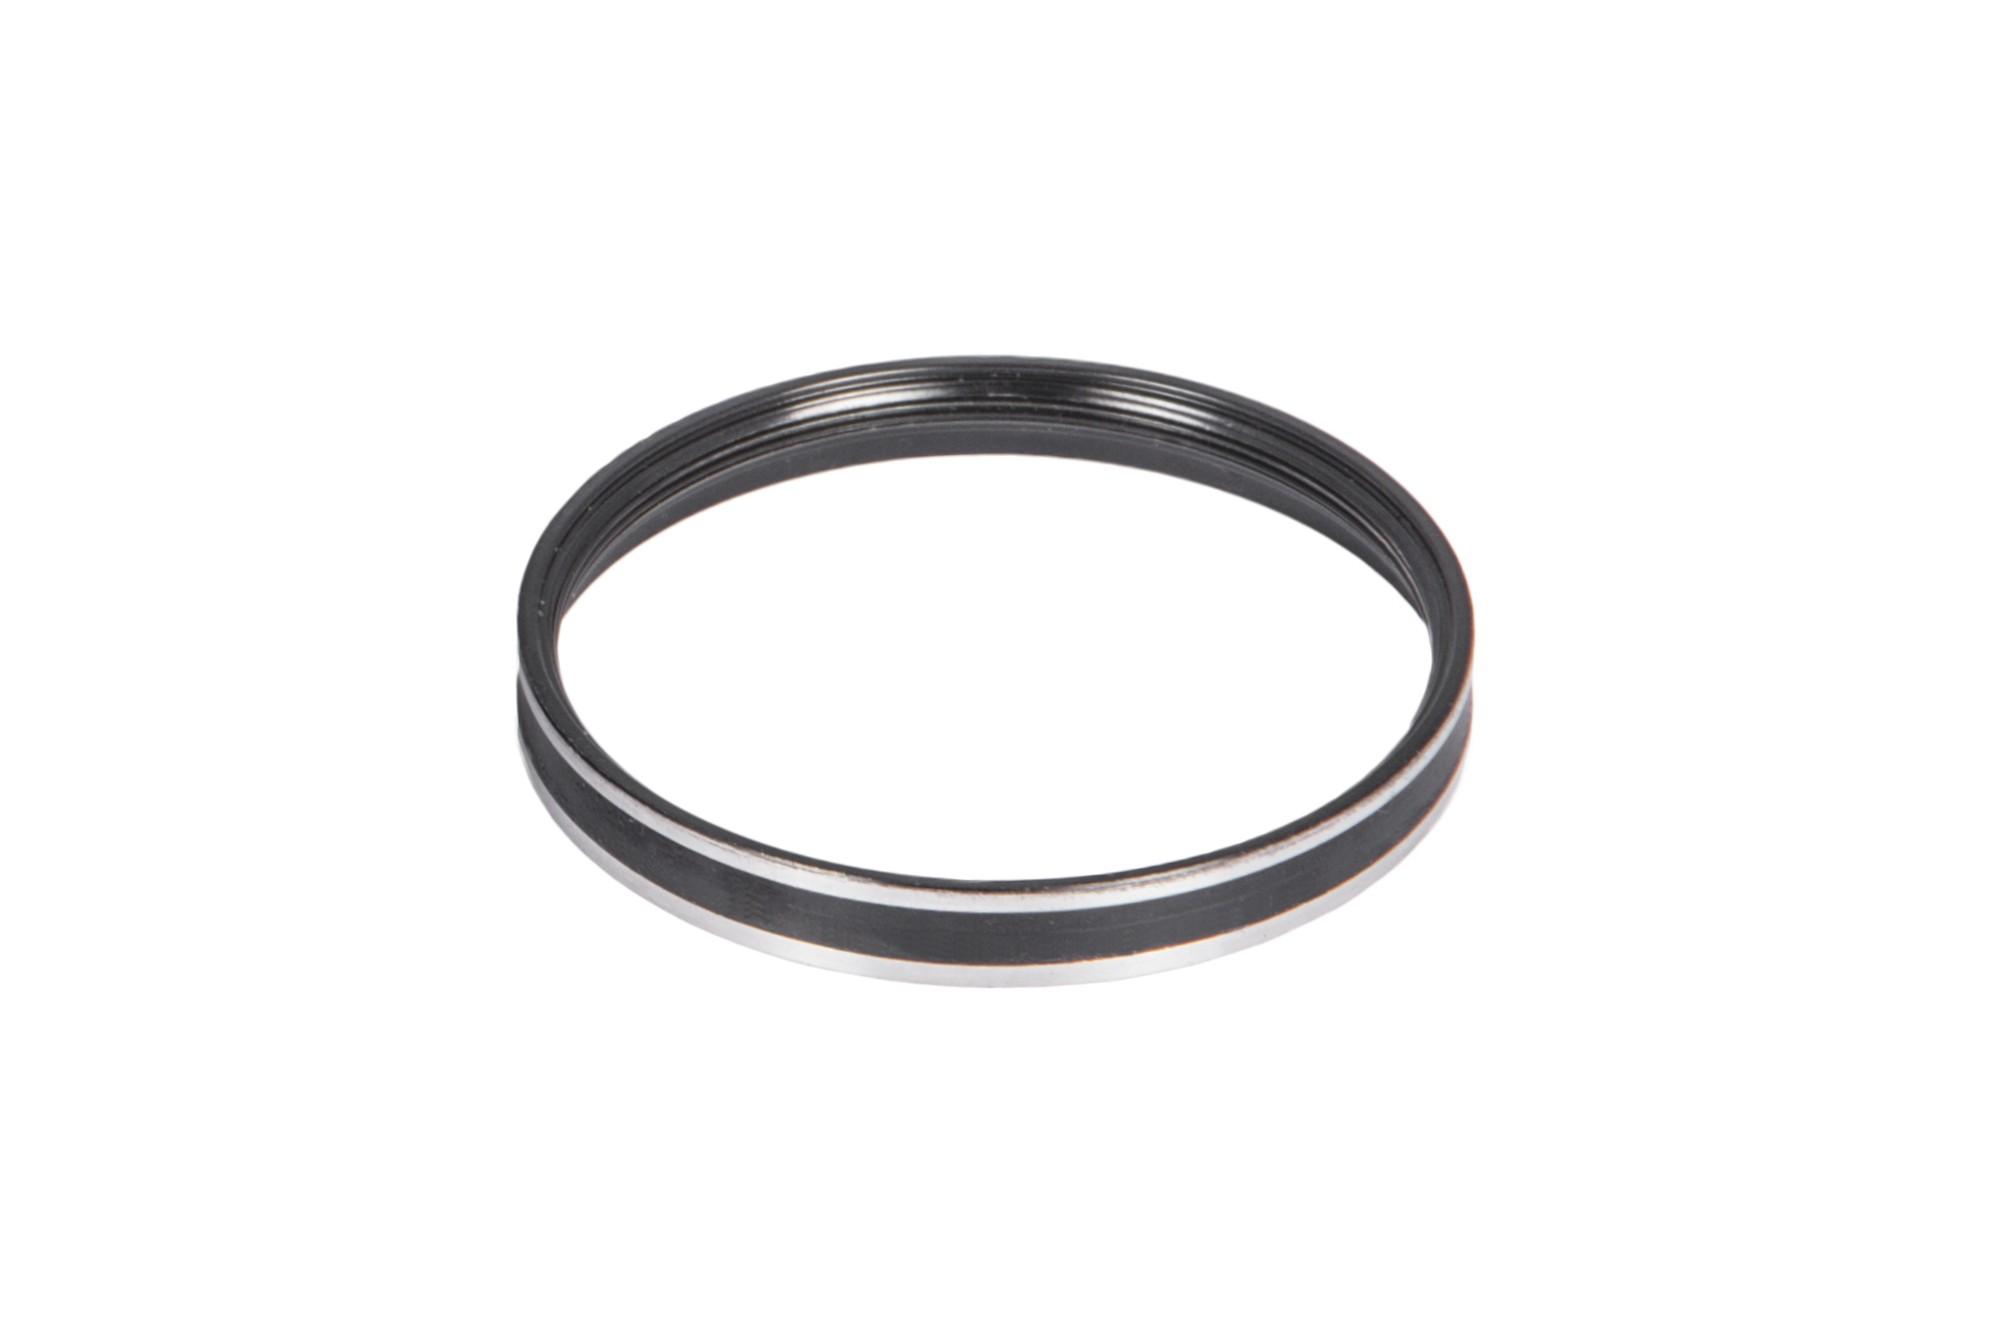 Changer Ring S52 / M48